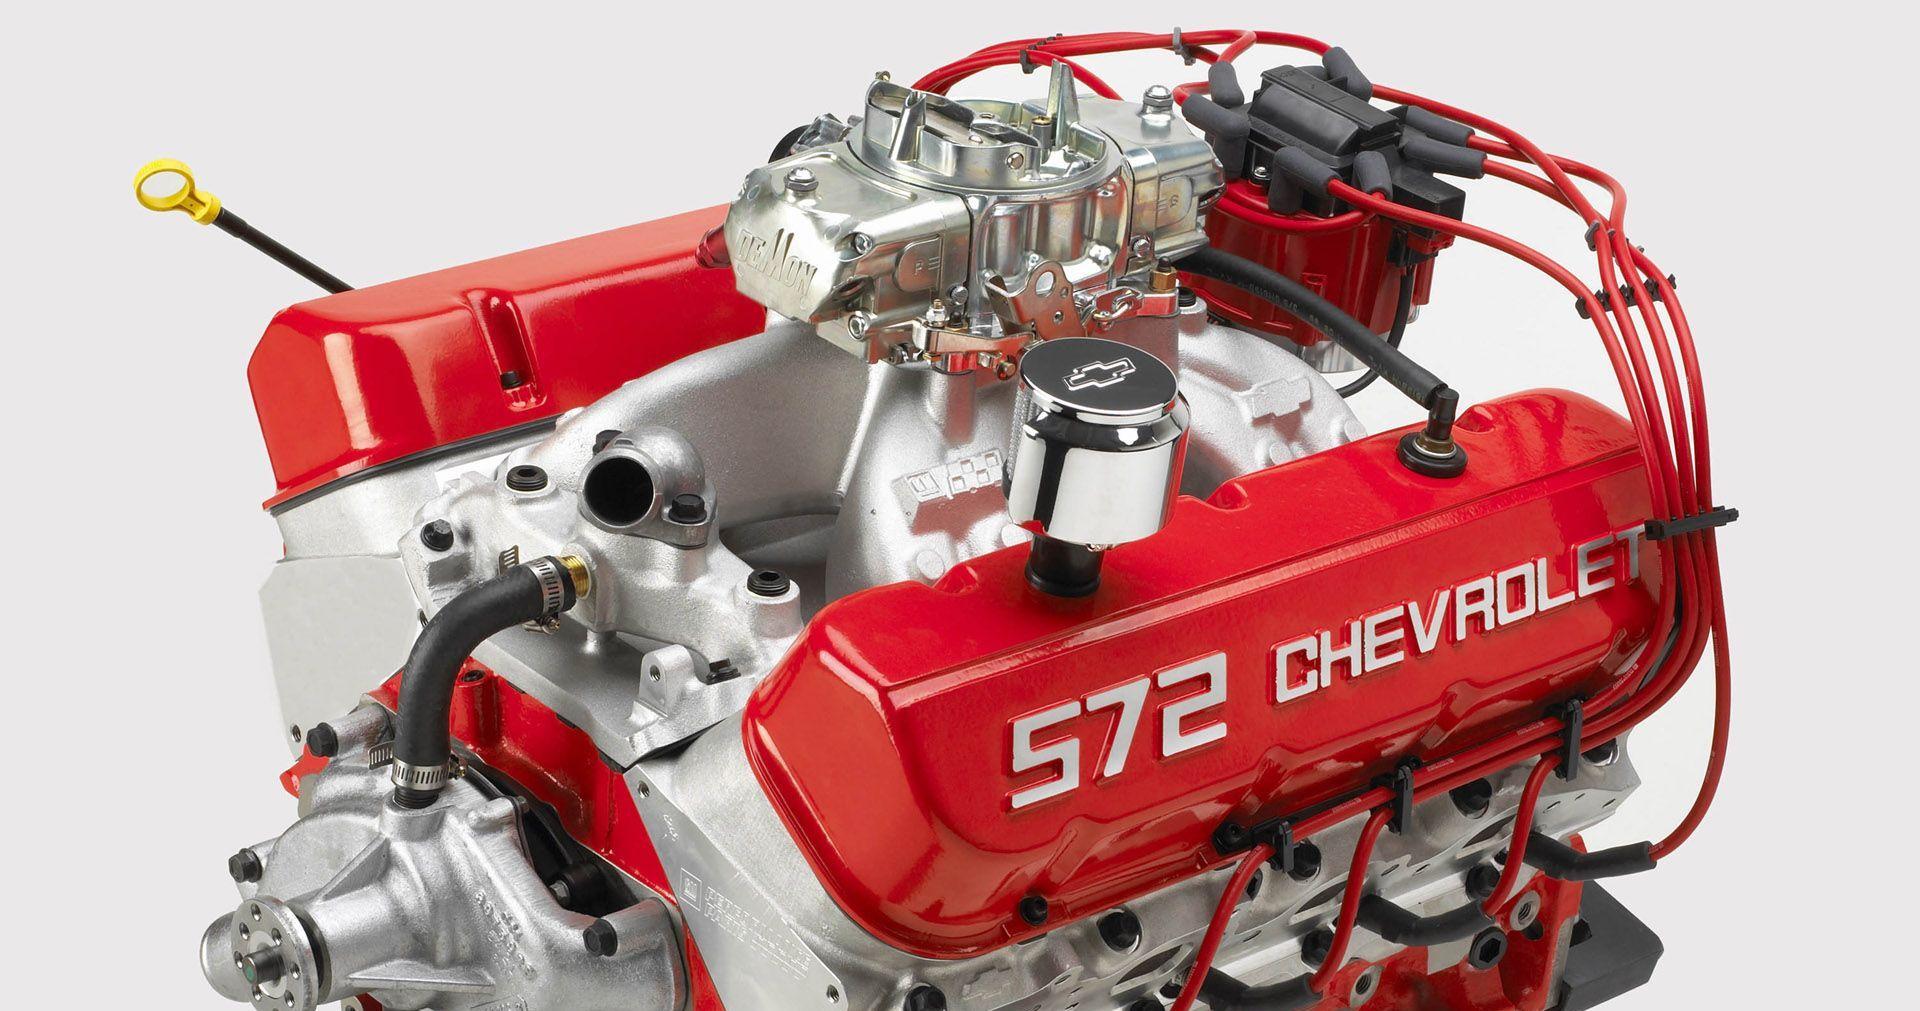 Kelebihan Kekurangan Chevrolet 572 Review